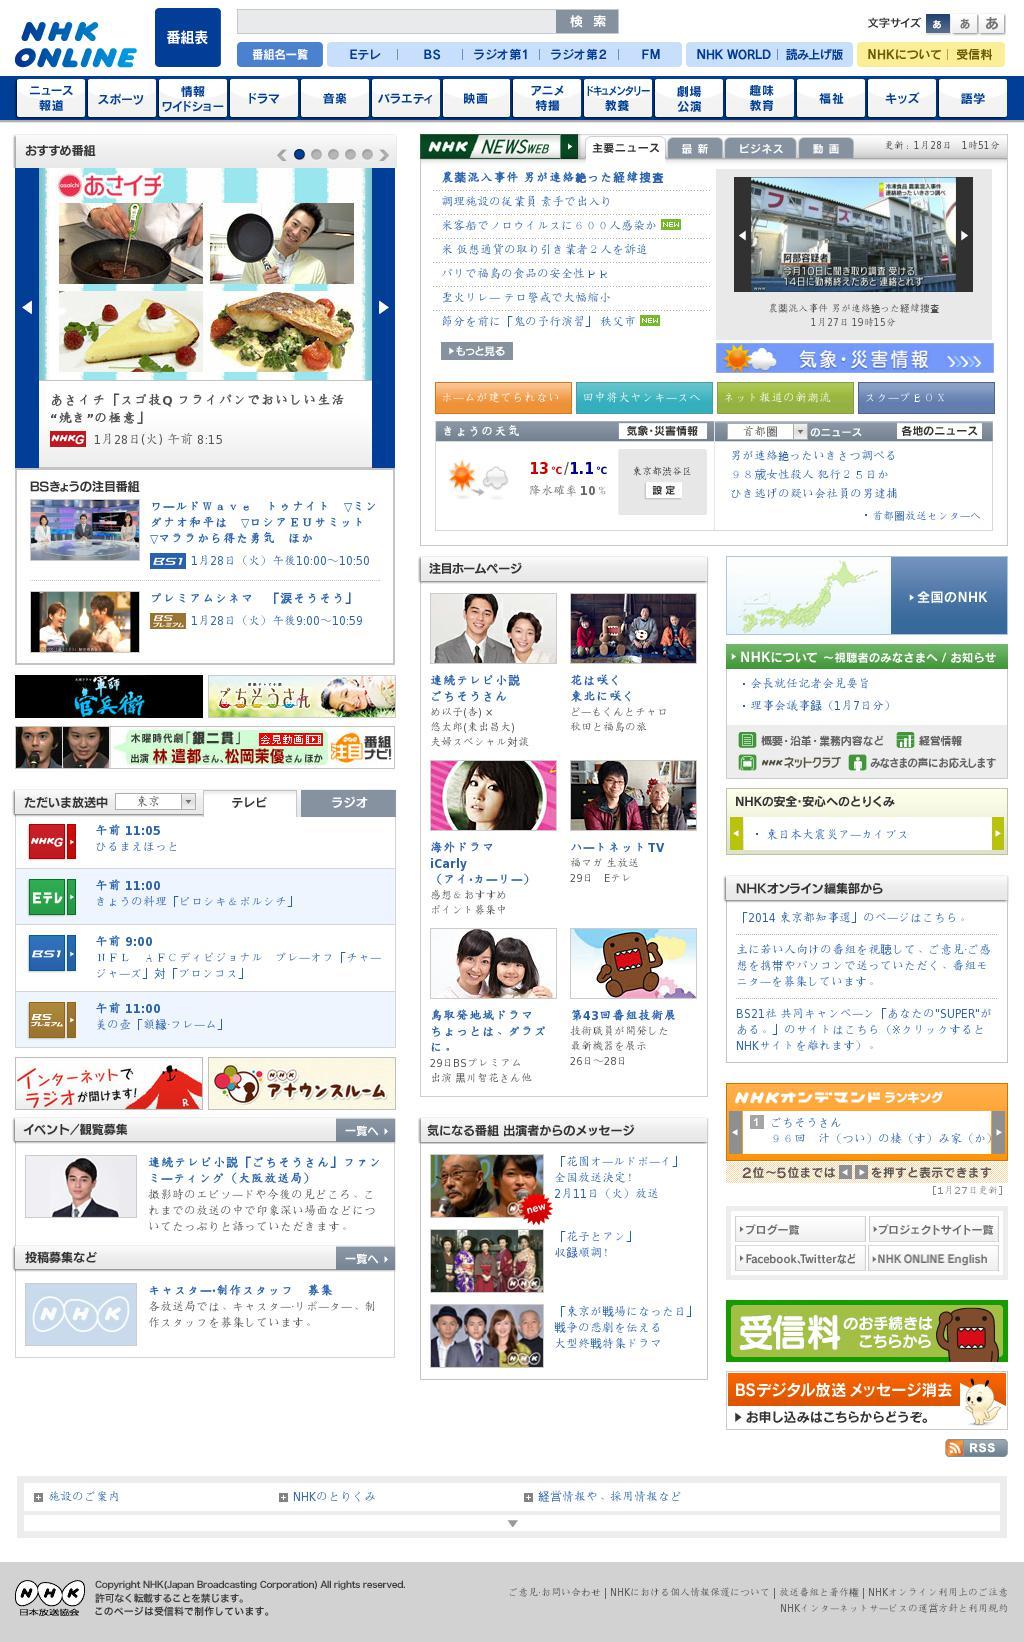 NHK Online at Tuesday Jan. 28, 2014, 2:17 a.m. UTC